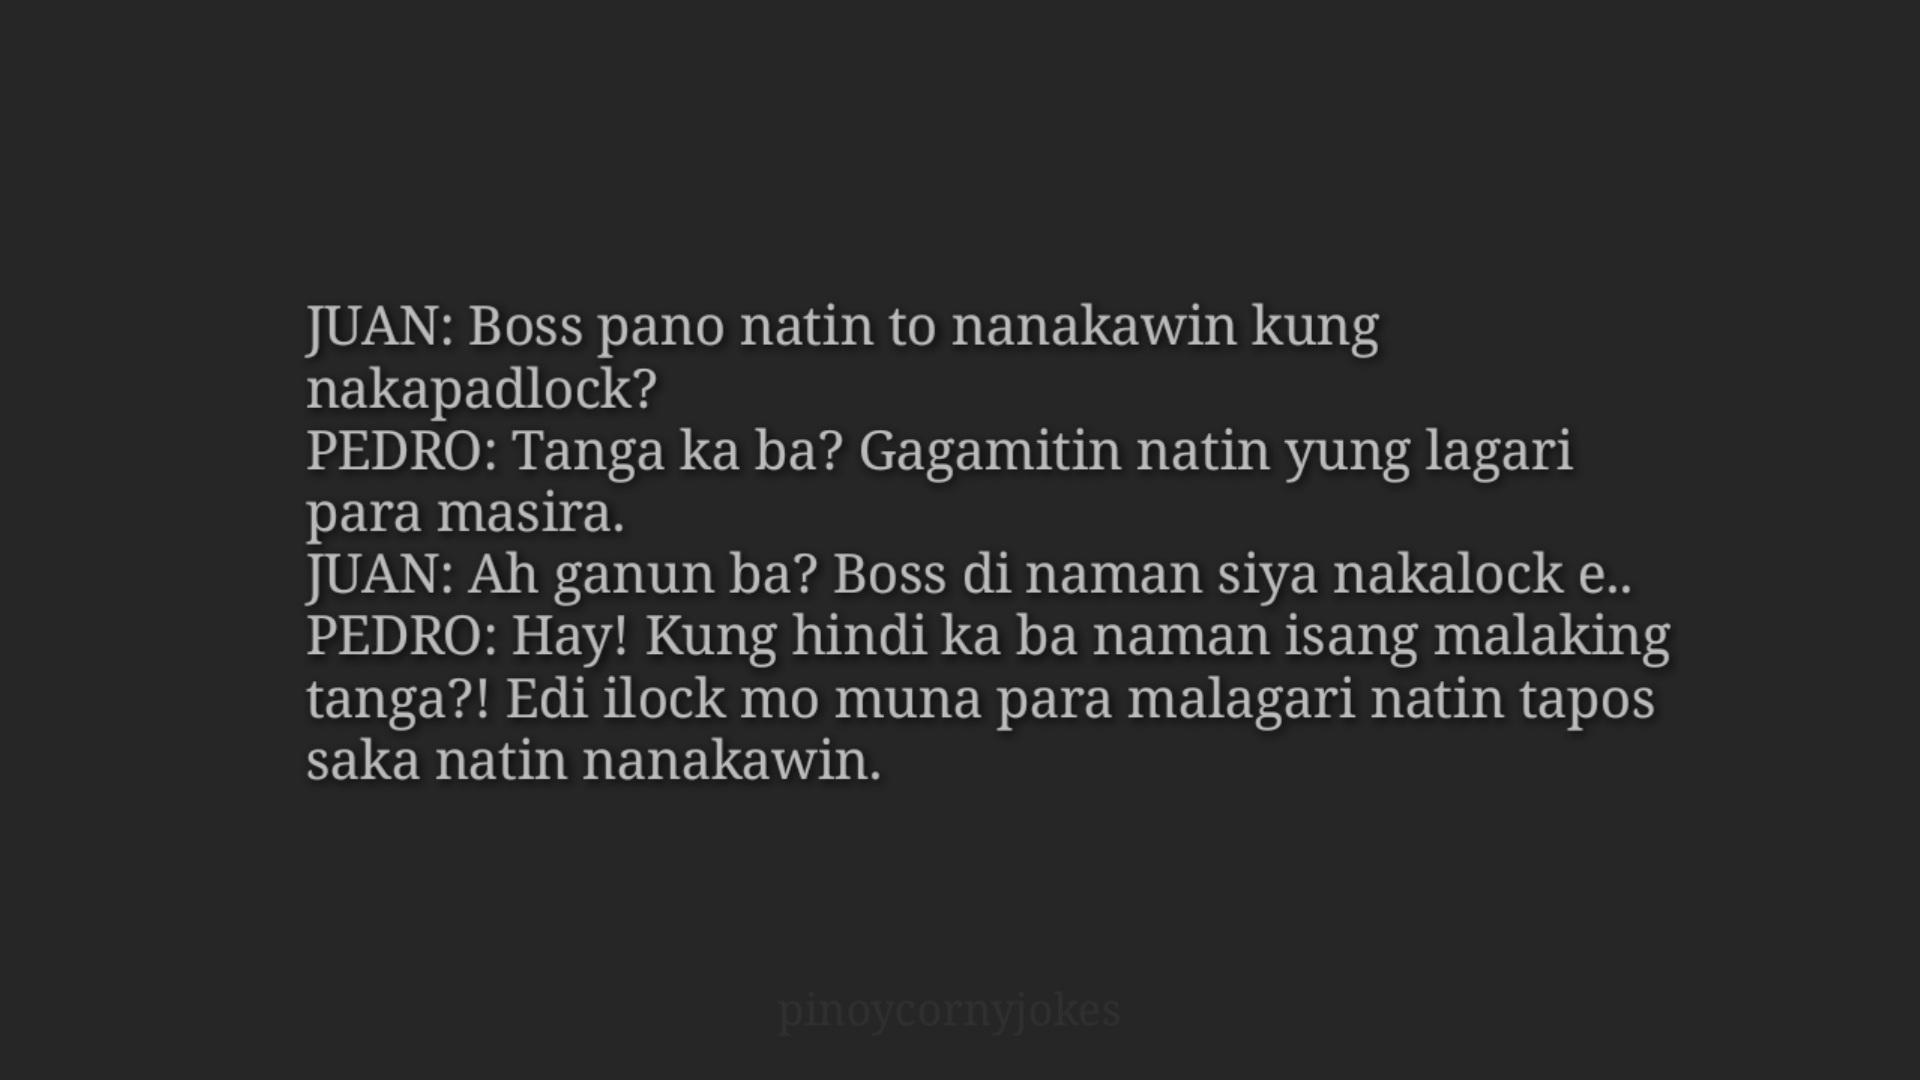 Magnanakaw - Best Tagalog Jokes